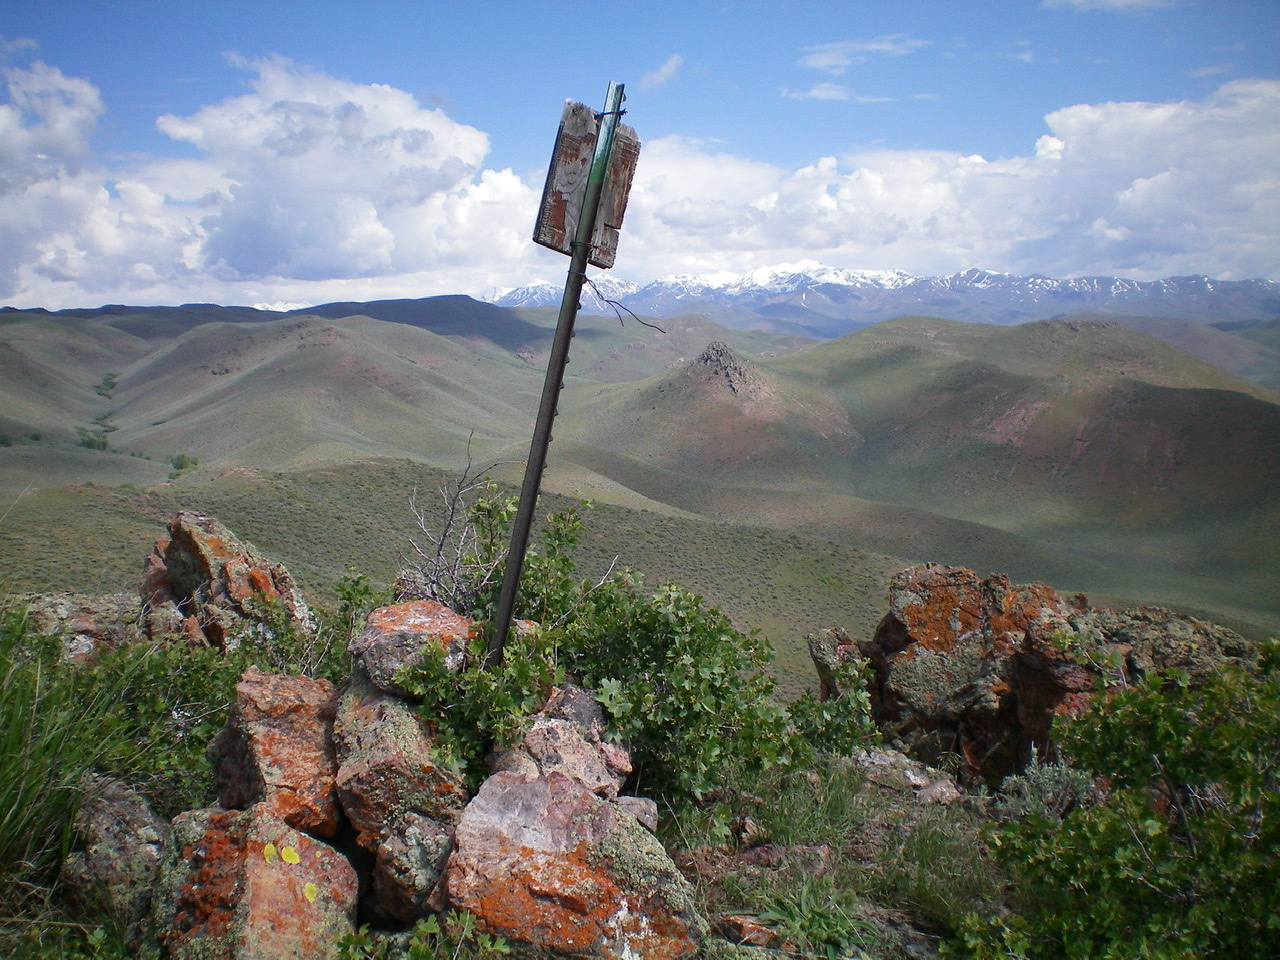 The summit cairn and survey marker atop Peak 6041. Livingston Douglas Photo